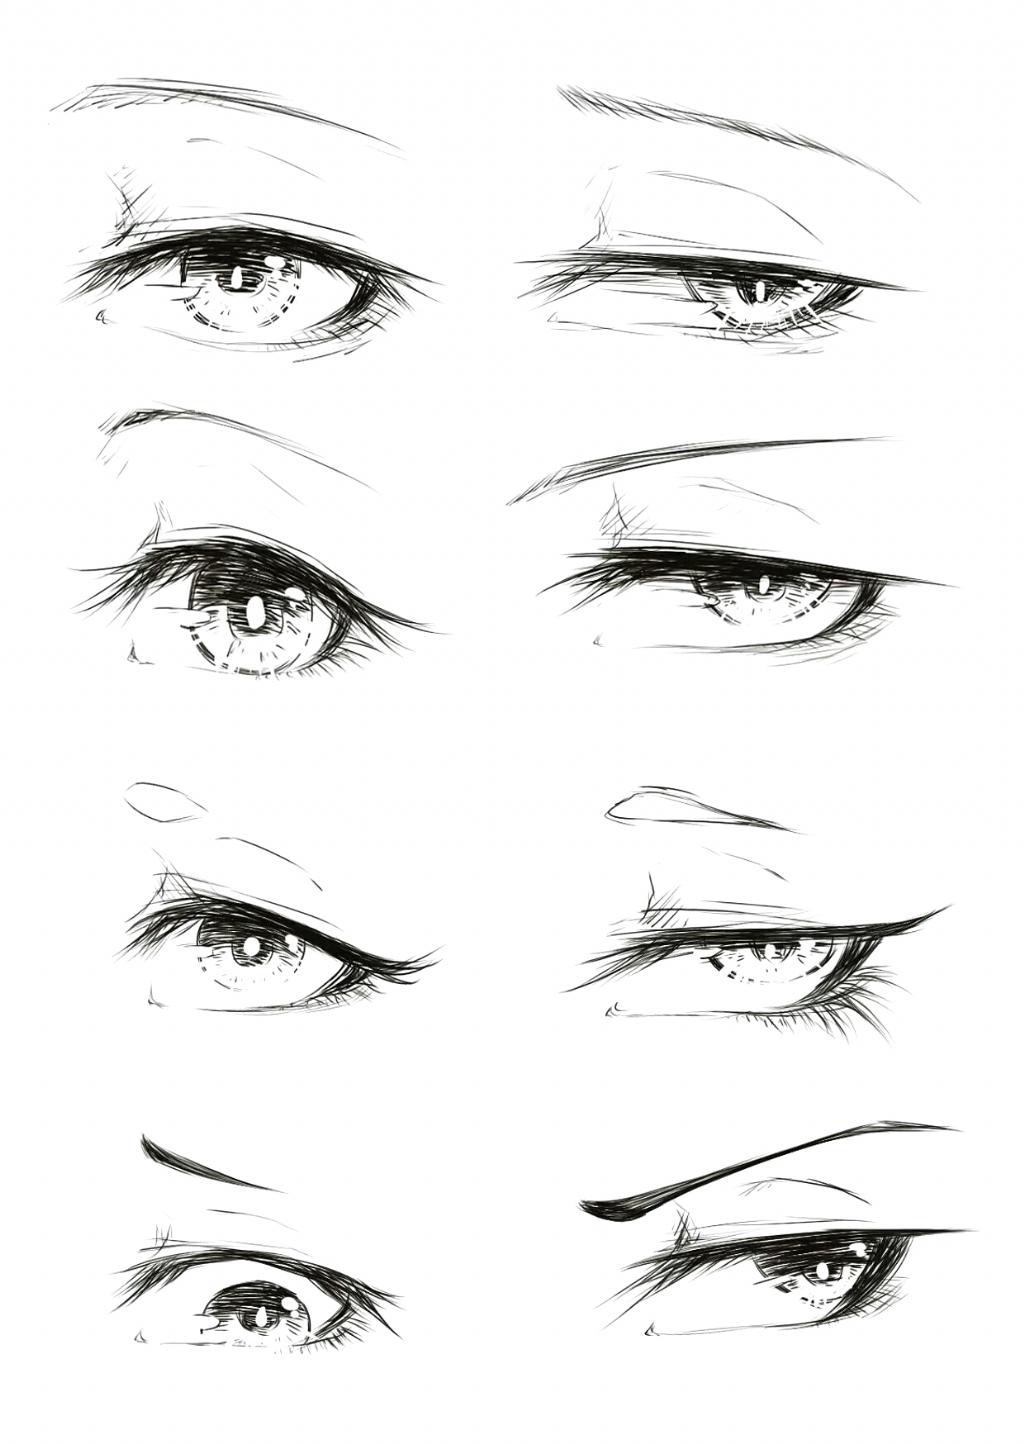 Gulay Yildirim Anime Eye Drawing Anime Drawings Sketches Anime Drawings Tutorials